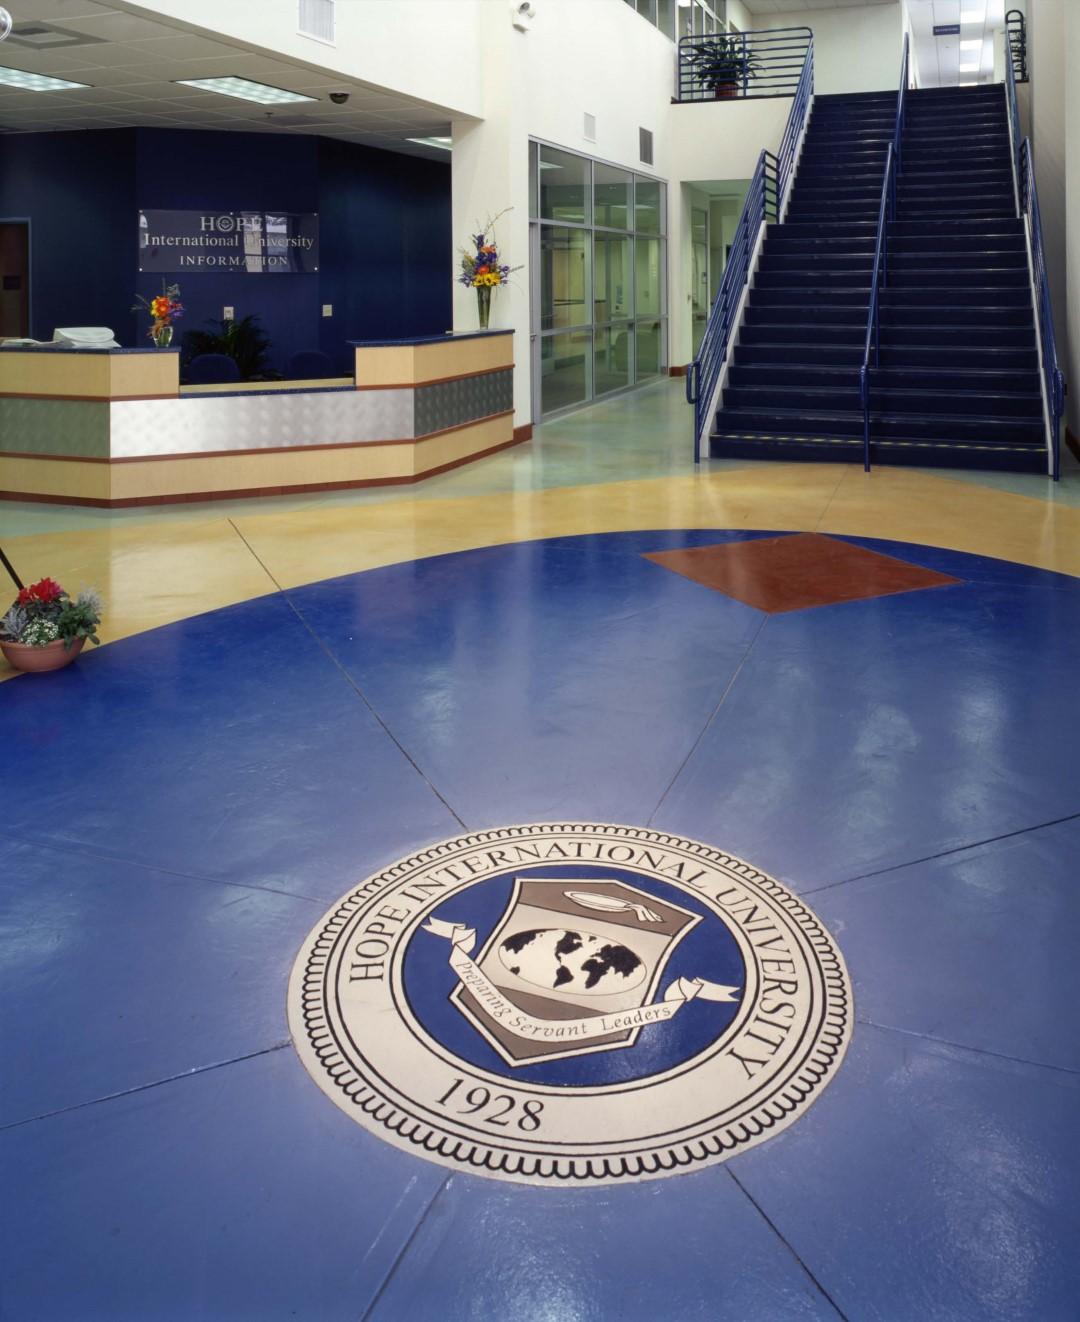 3 Hope International University, Gymnasium_Student Center (Gym), Fullerton, CA